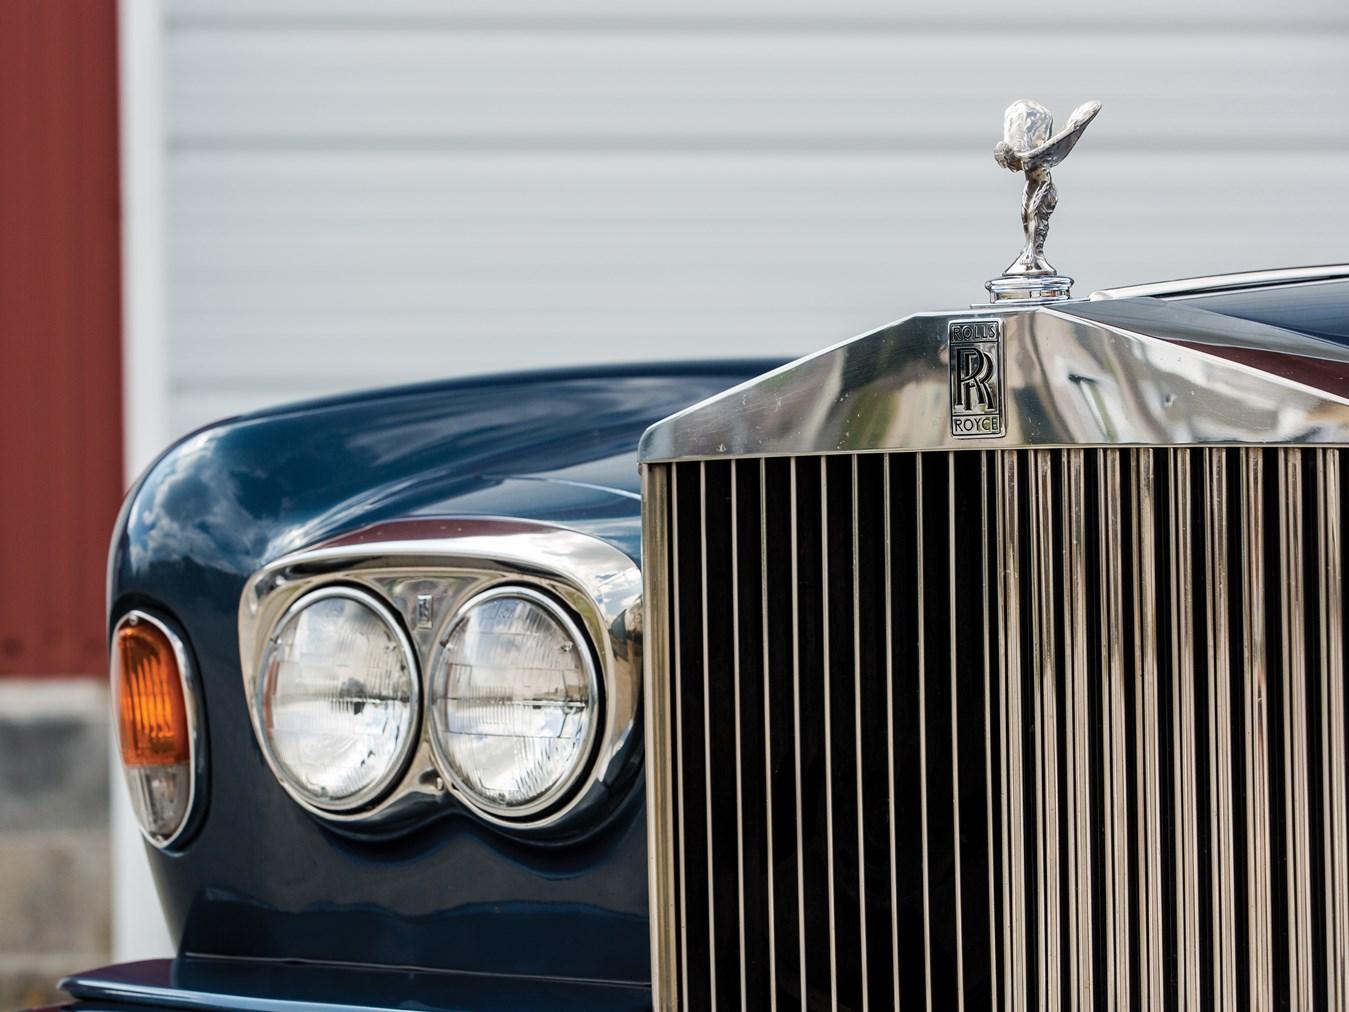 1985 Rolls-Royce Corniche Drophead Coupe grille detail